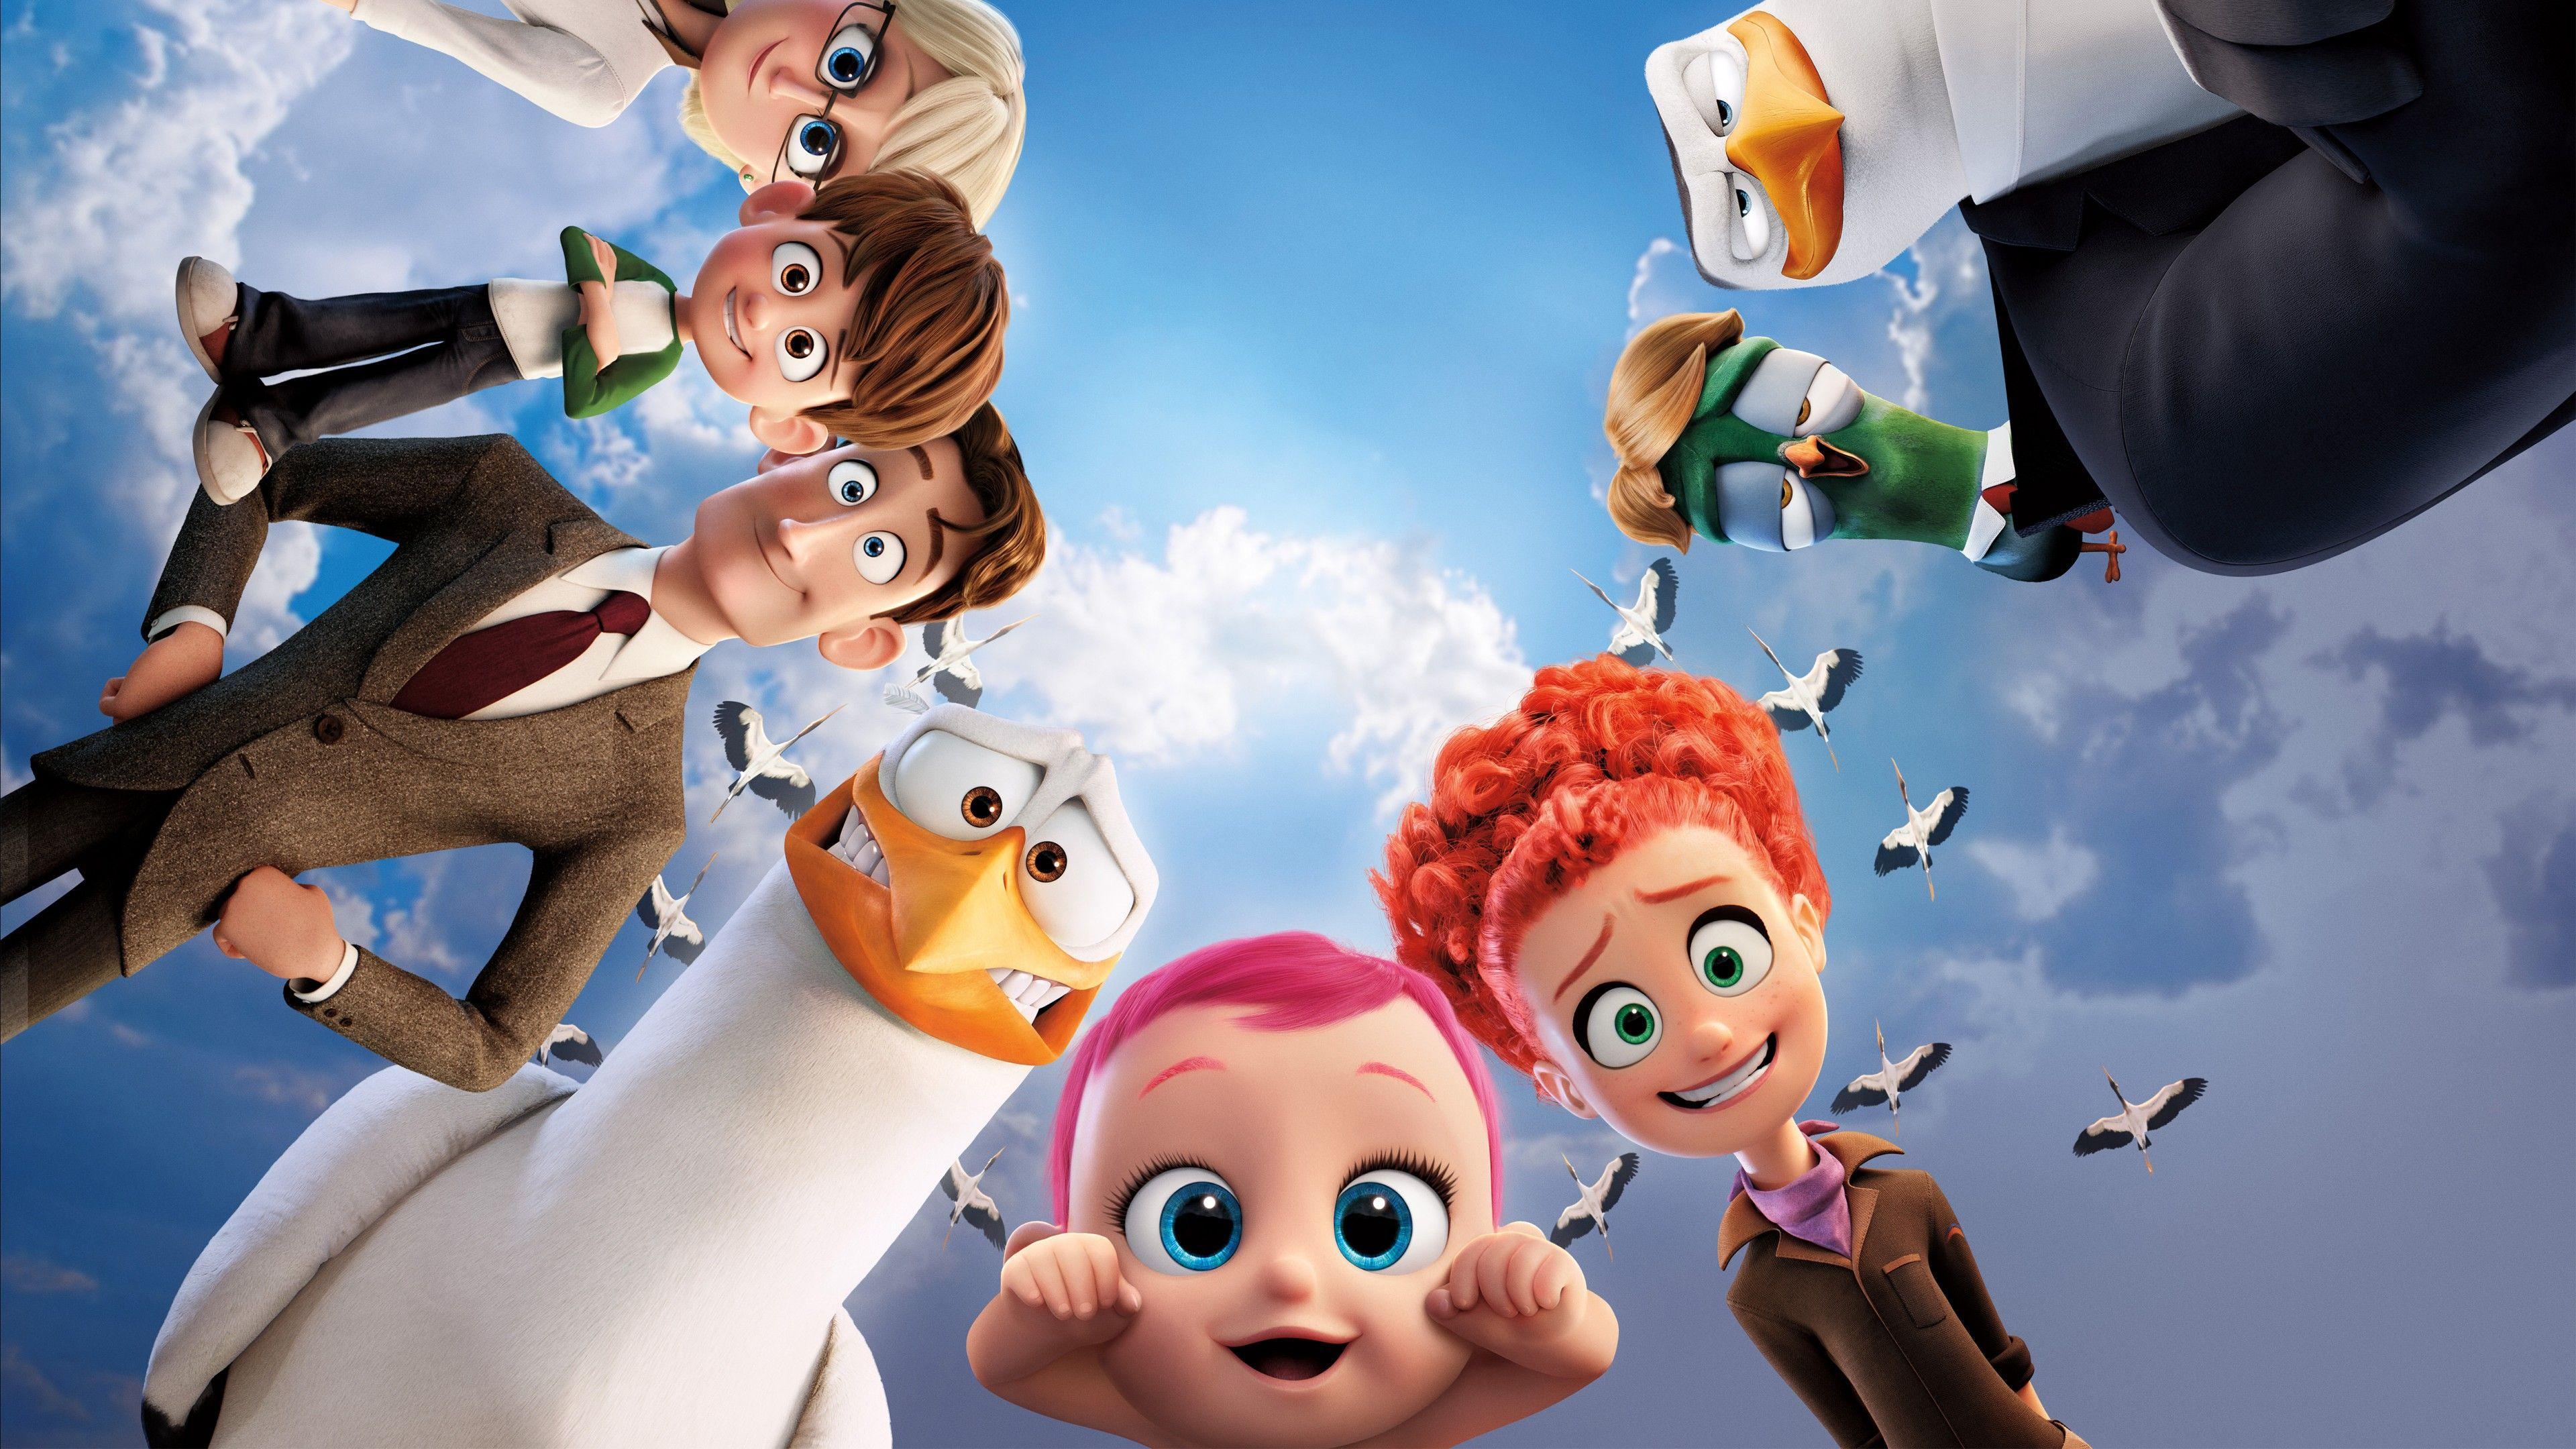 Free Full Cartoon Movies cartoon film wallpapers - top free cartoon film backgrounds